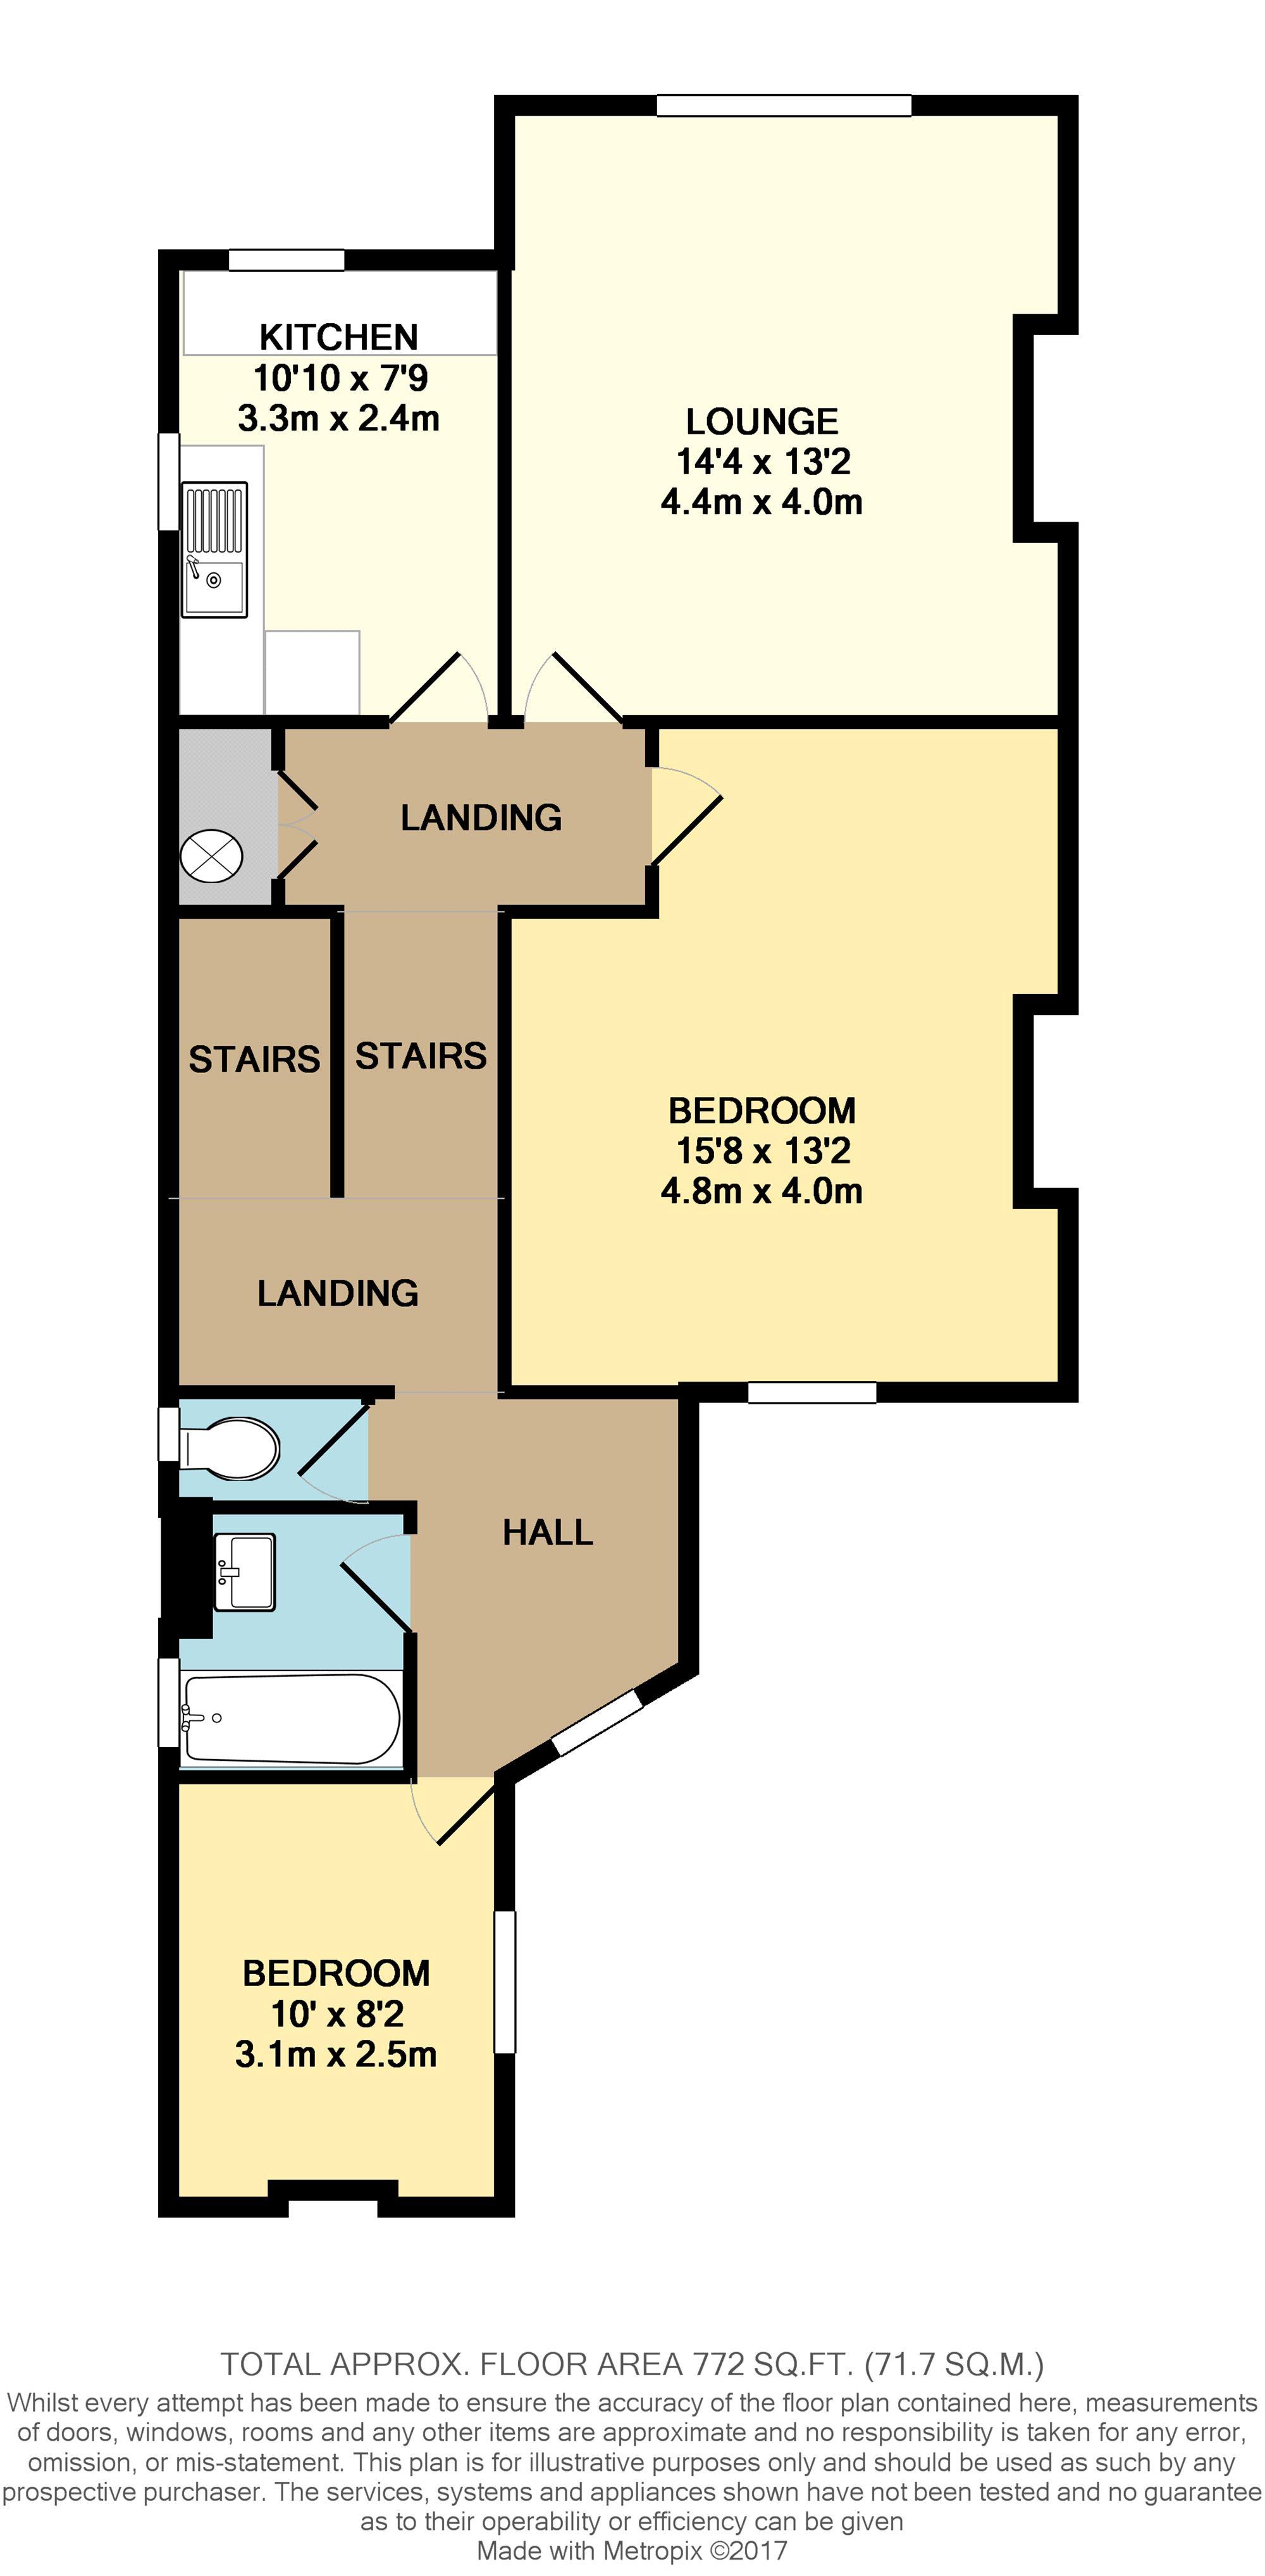 Floorplan of property at Sea Road